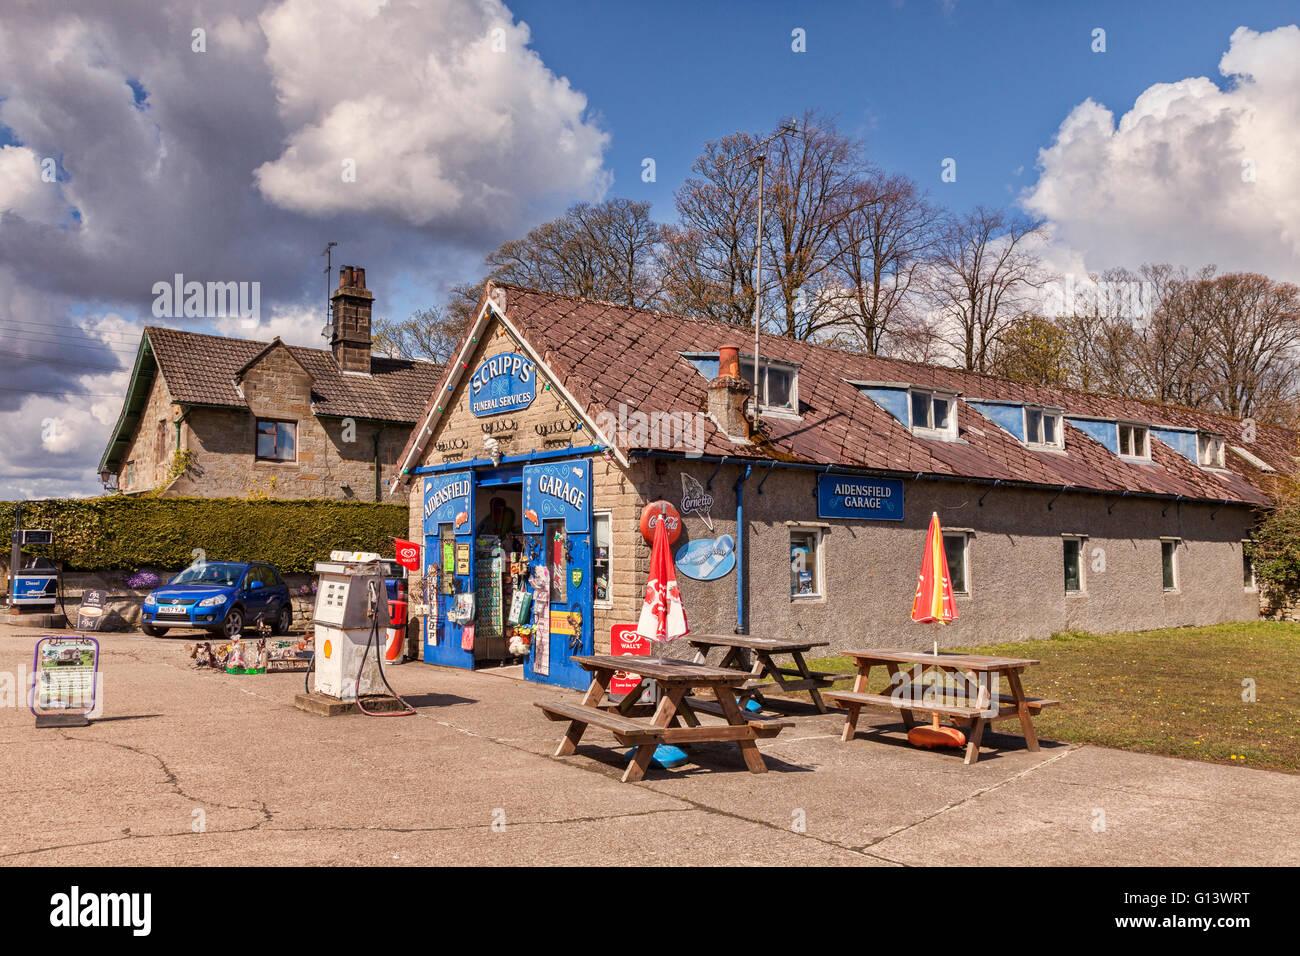 Aidensfield Garage, Goathland, North Yorkshire, England, UK - Stock Image